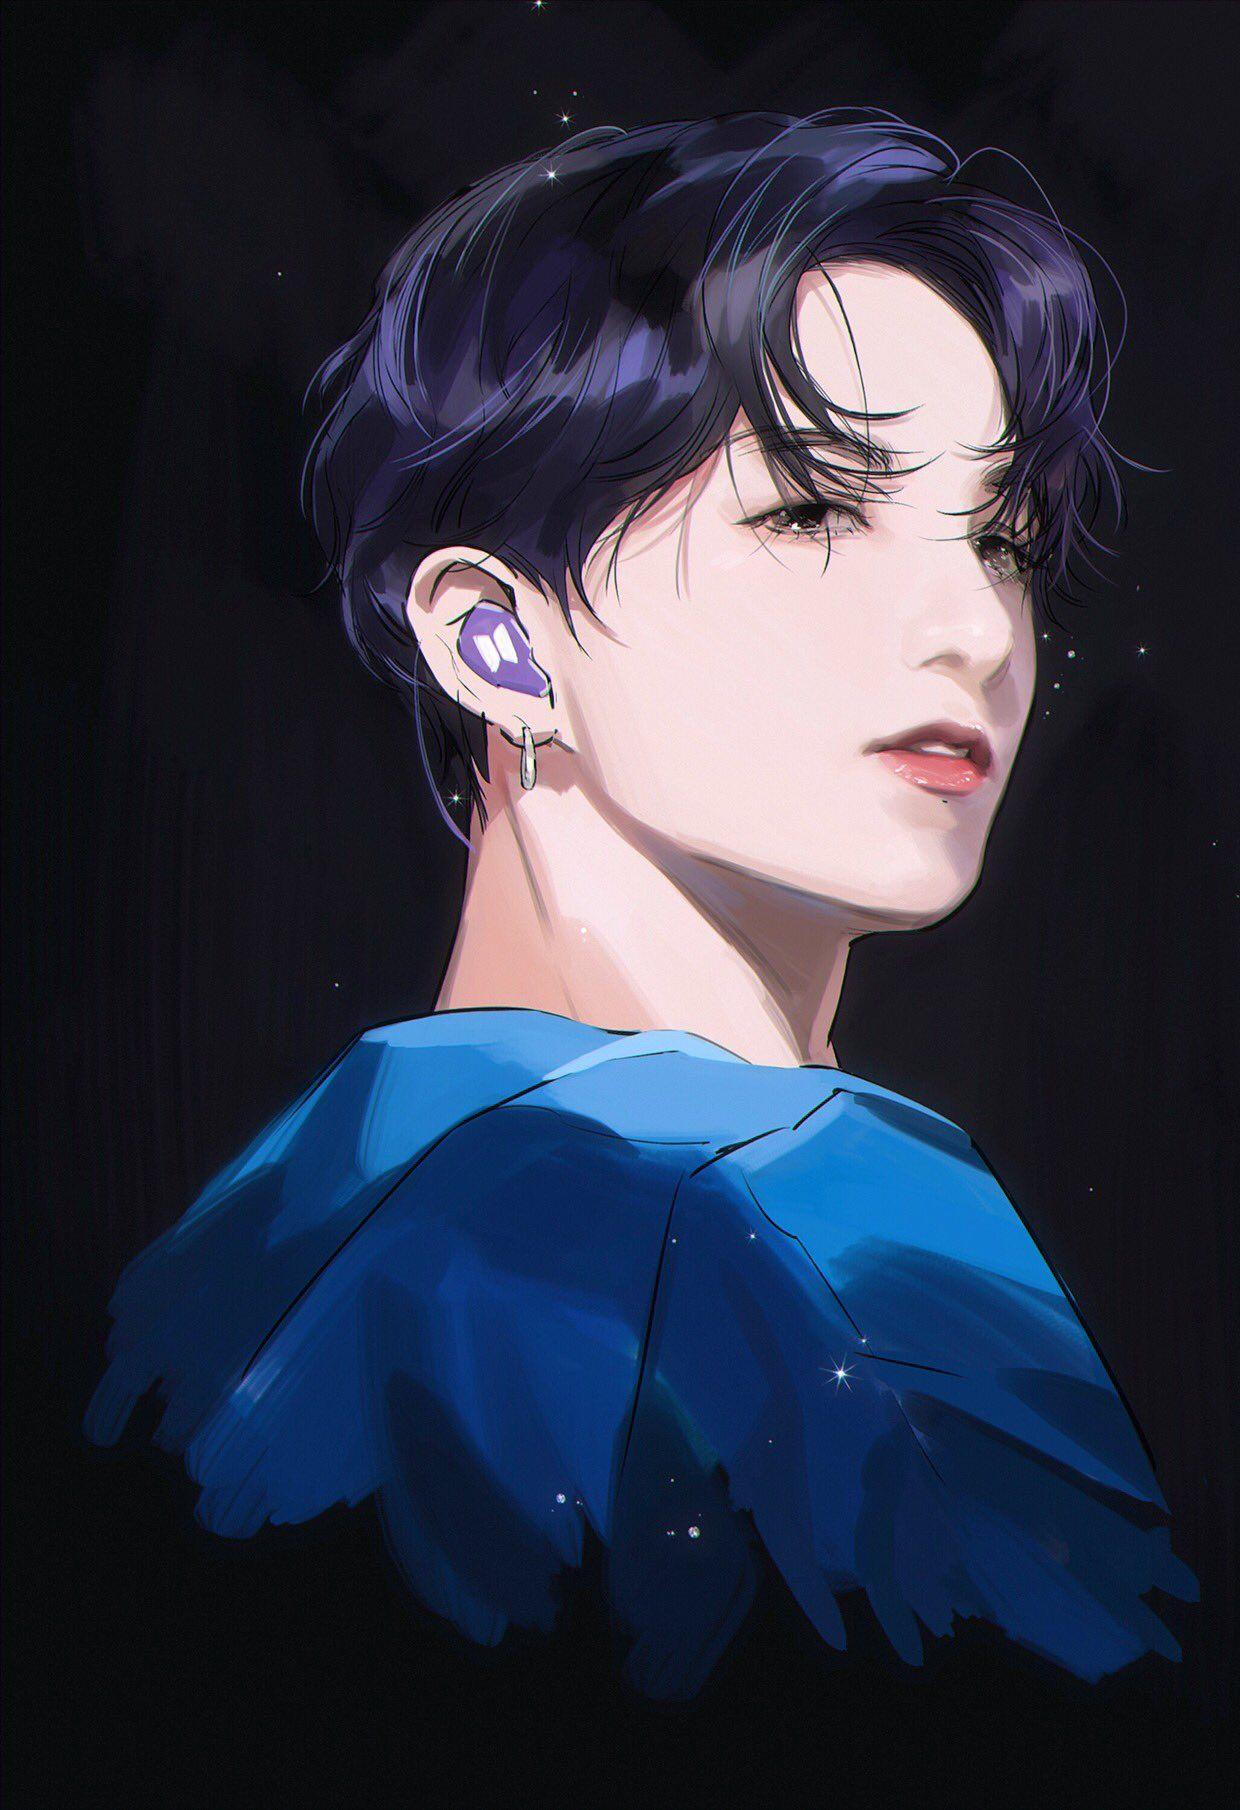 Pin oleh Who? di BTS and BLACKPINK FanArt Gambar anime